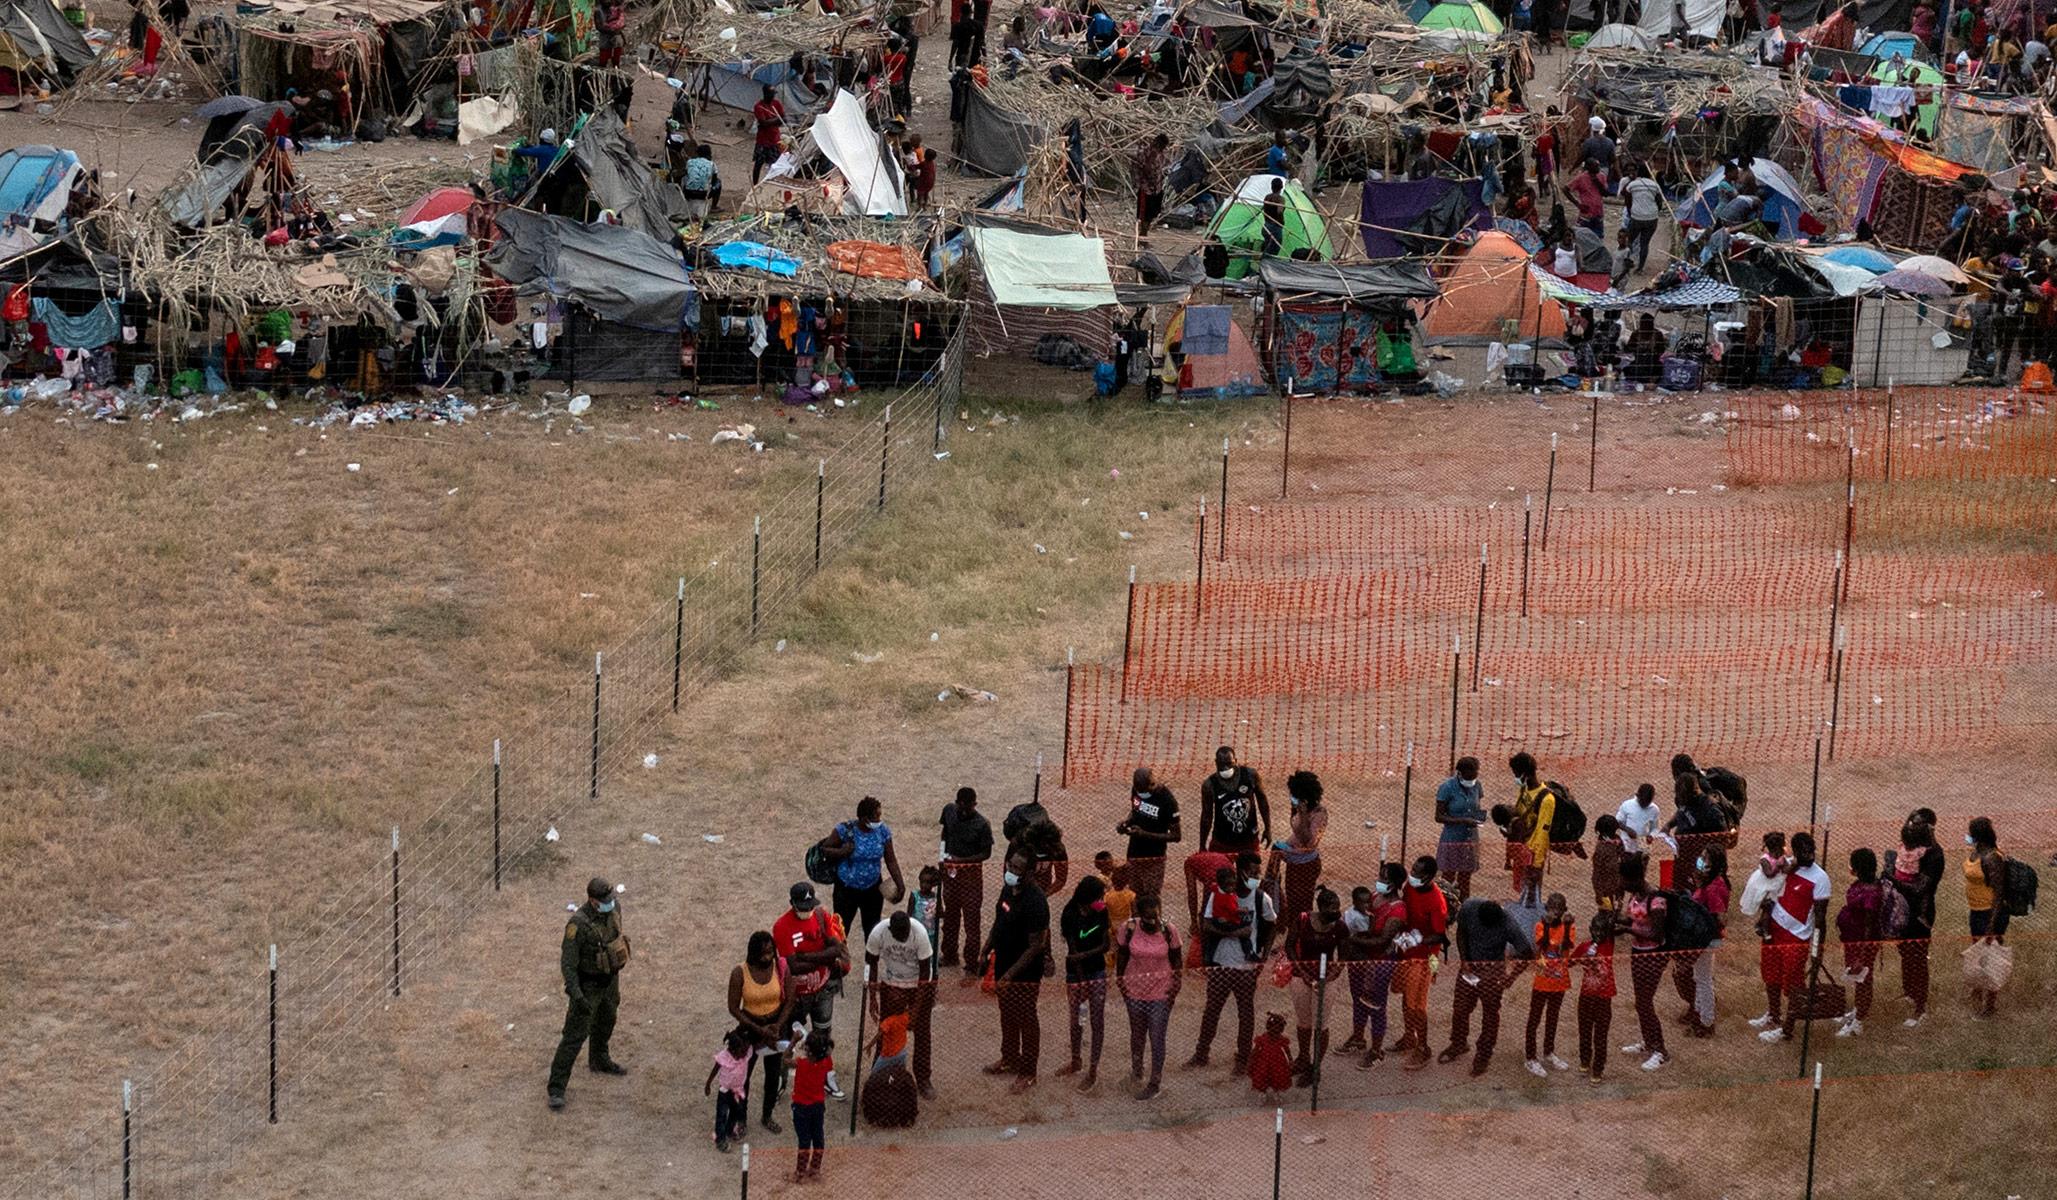 U.S. Special Envoy to Haiti Resigns over 'Inhumane' Deportation of Haitians